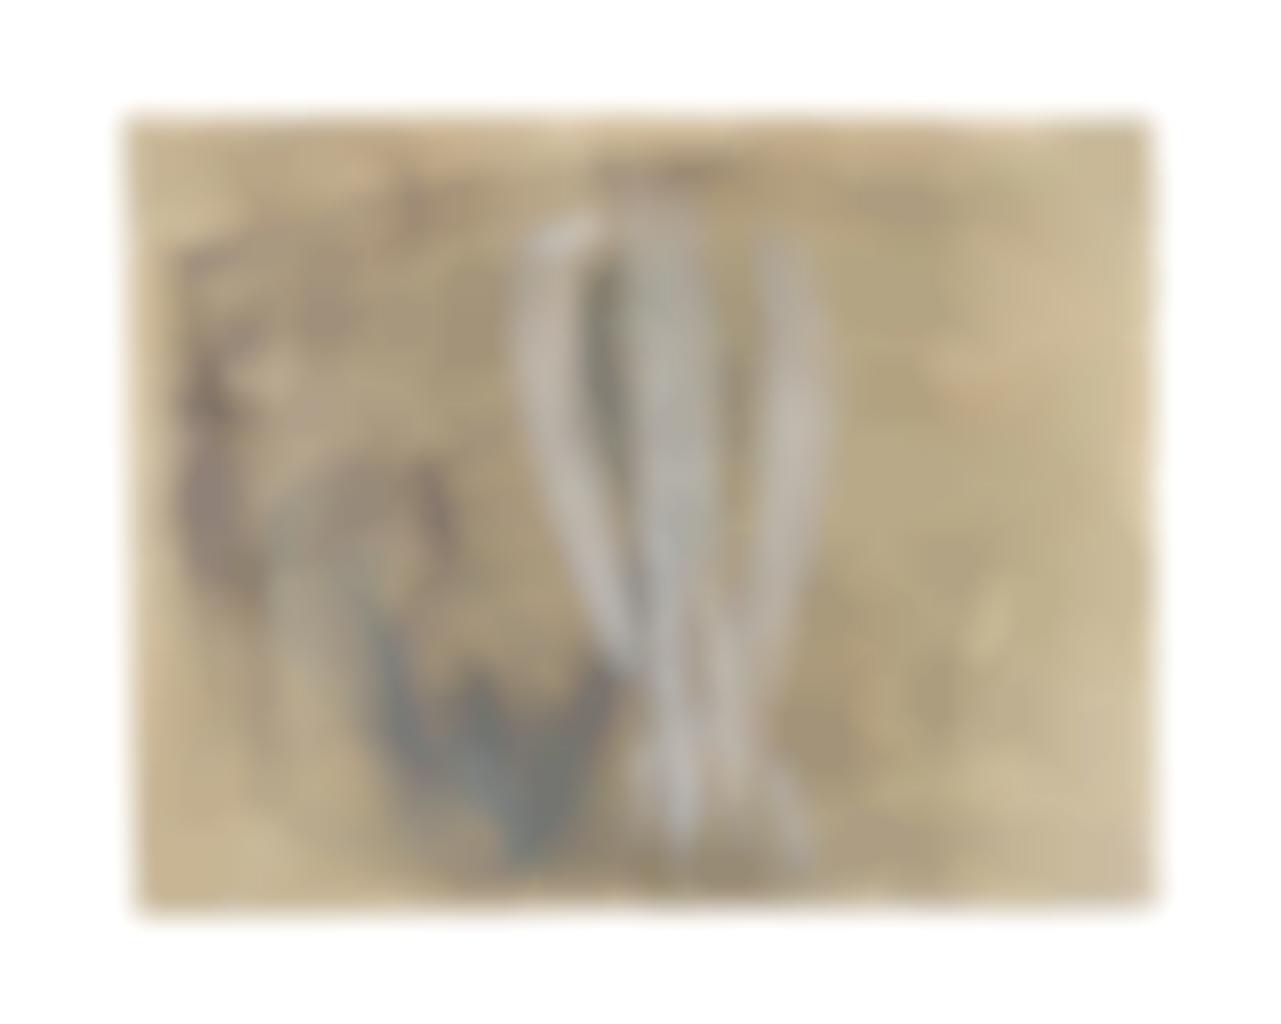 Joseph Beuys-Untitled-1952